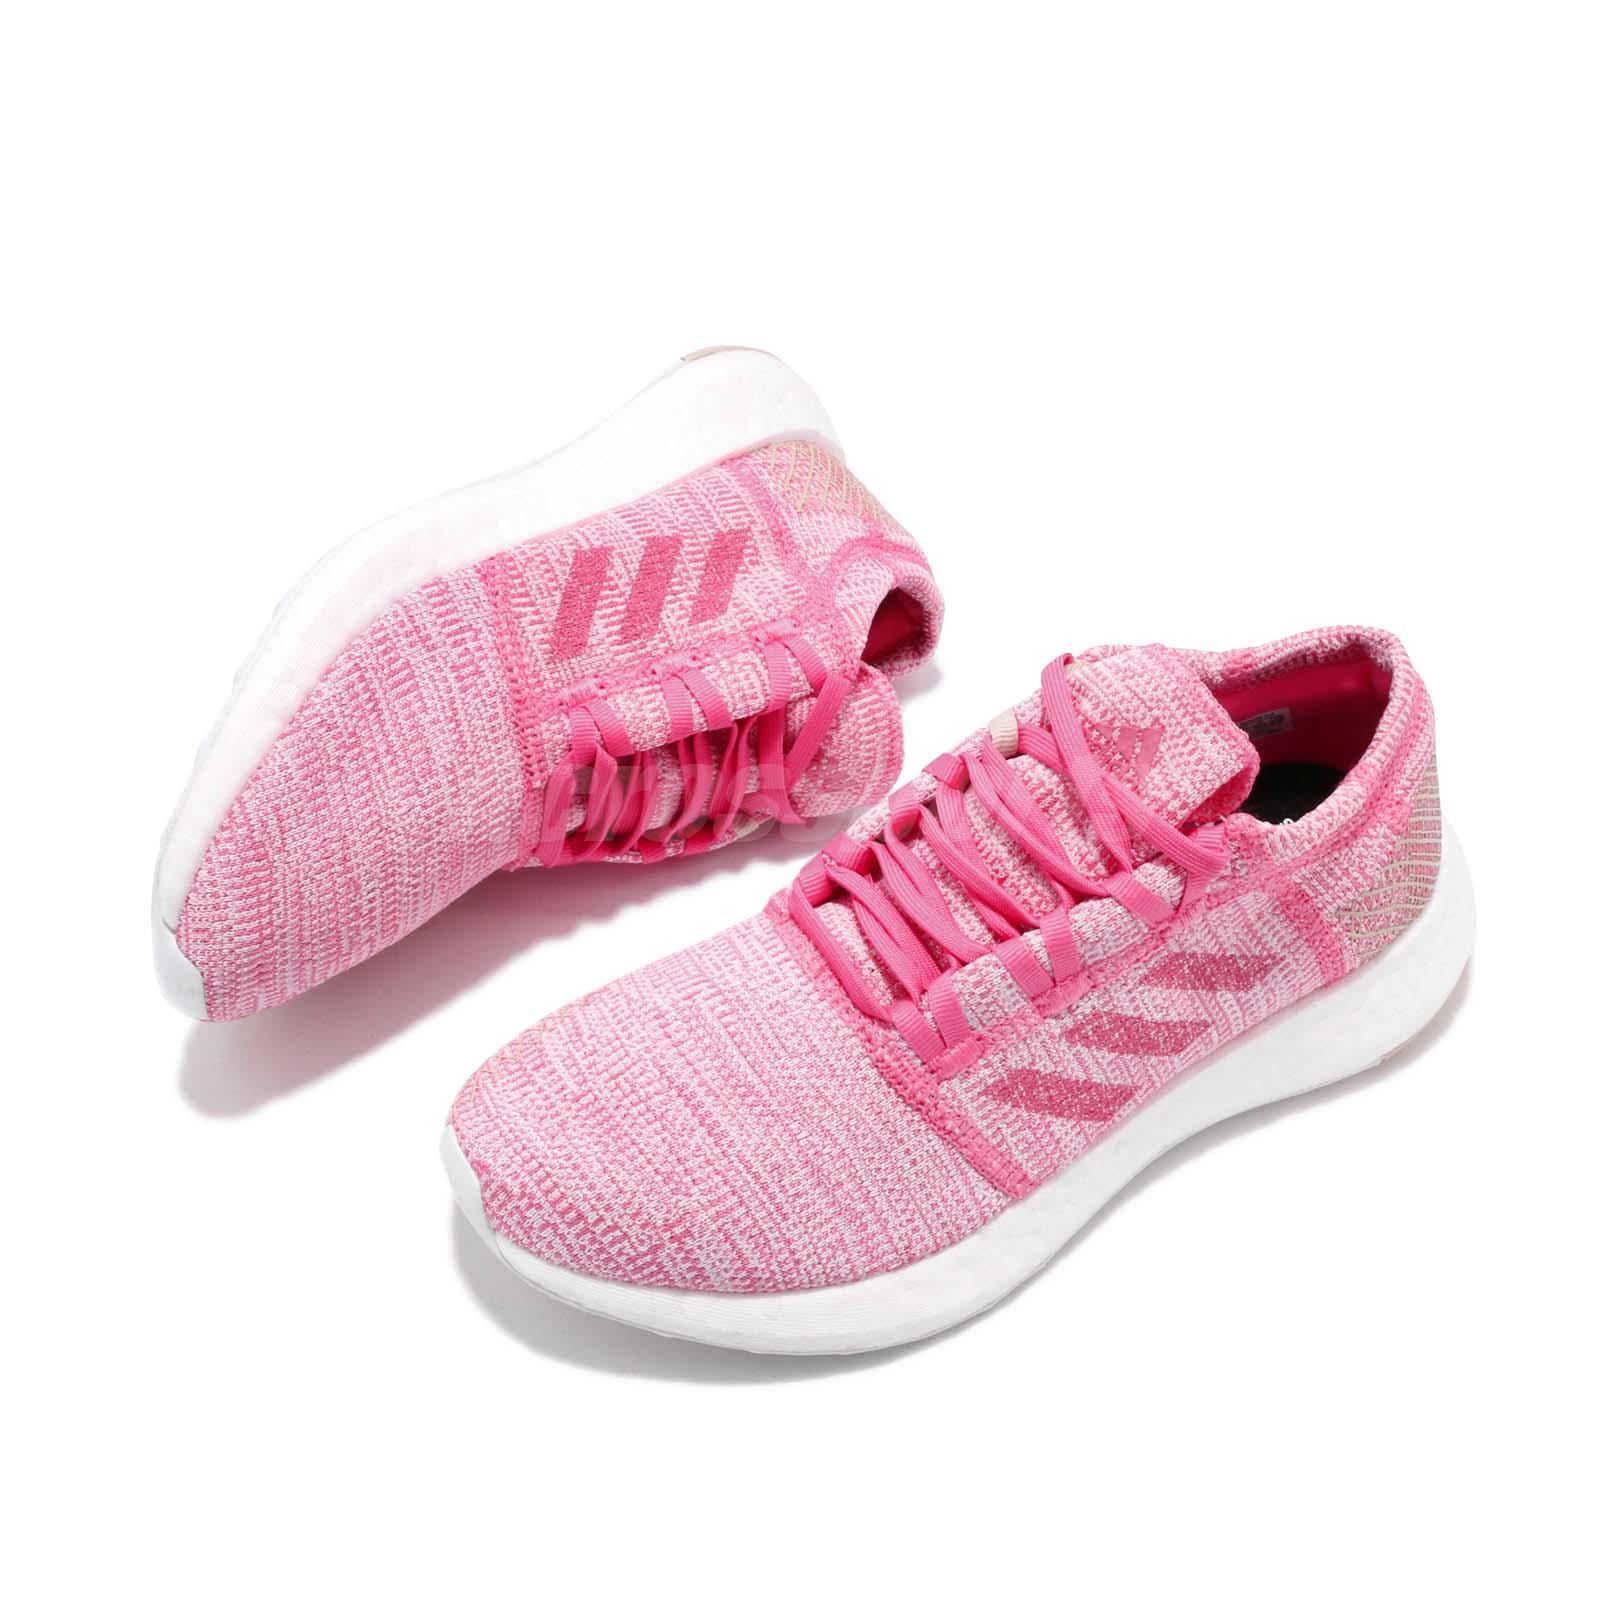 05e12f791 adidas PureBoost Go J Pink White Kid Junior Women Running Shoes ...